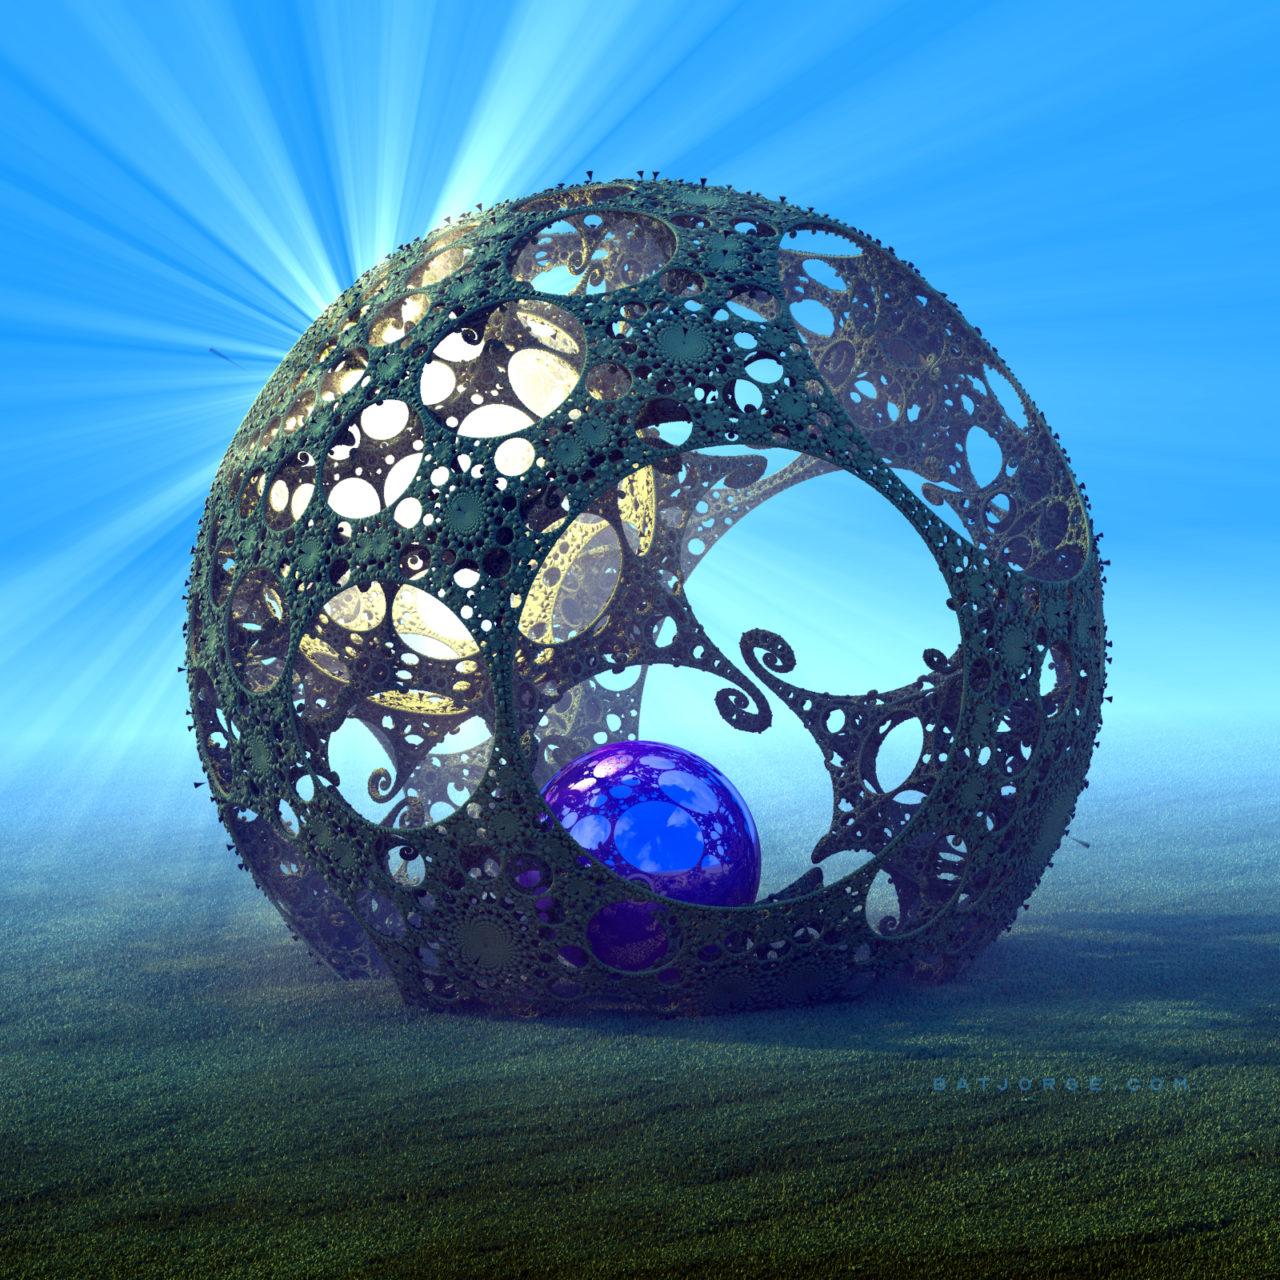 3d fractal. kleinian. mandelbulb3d